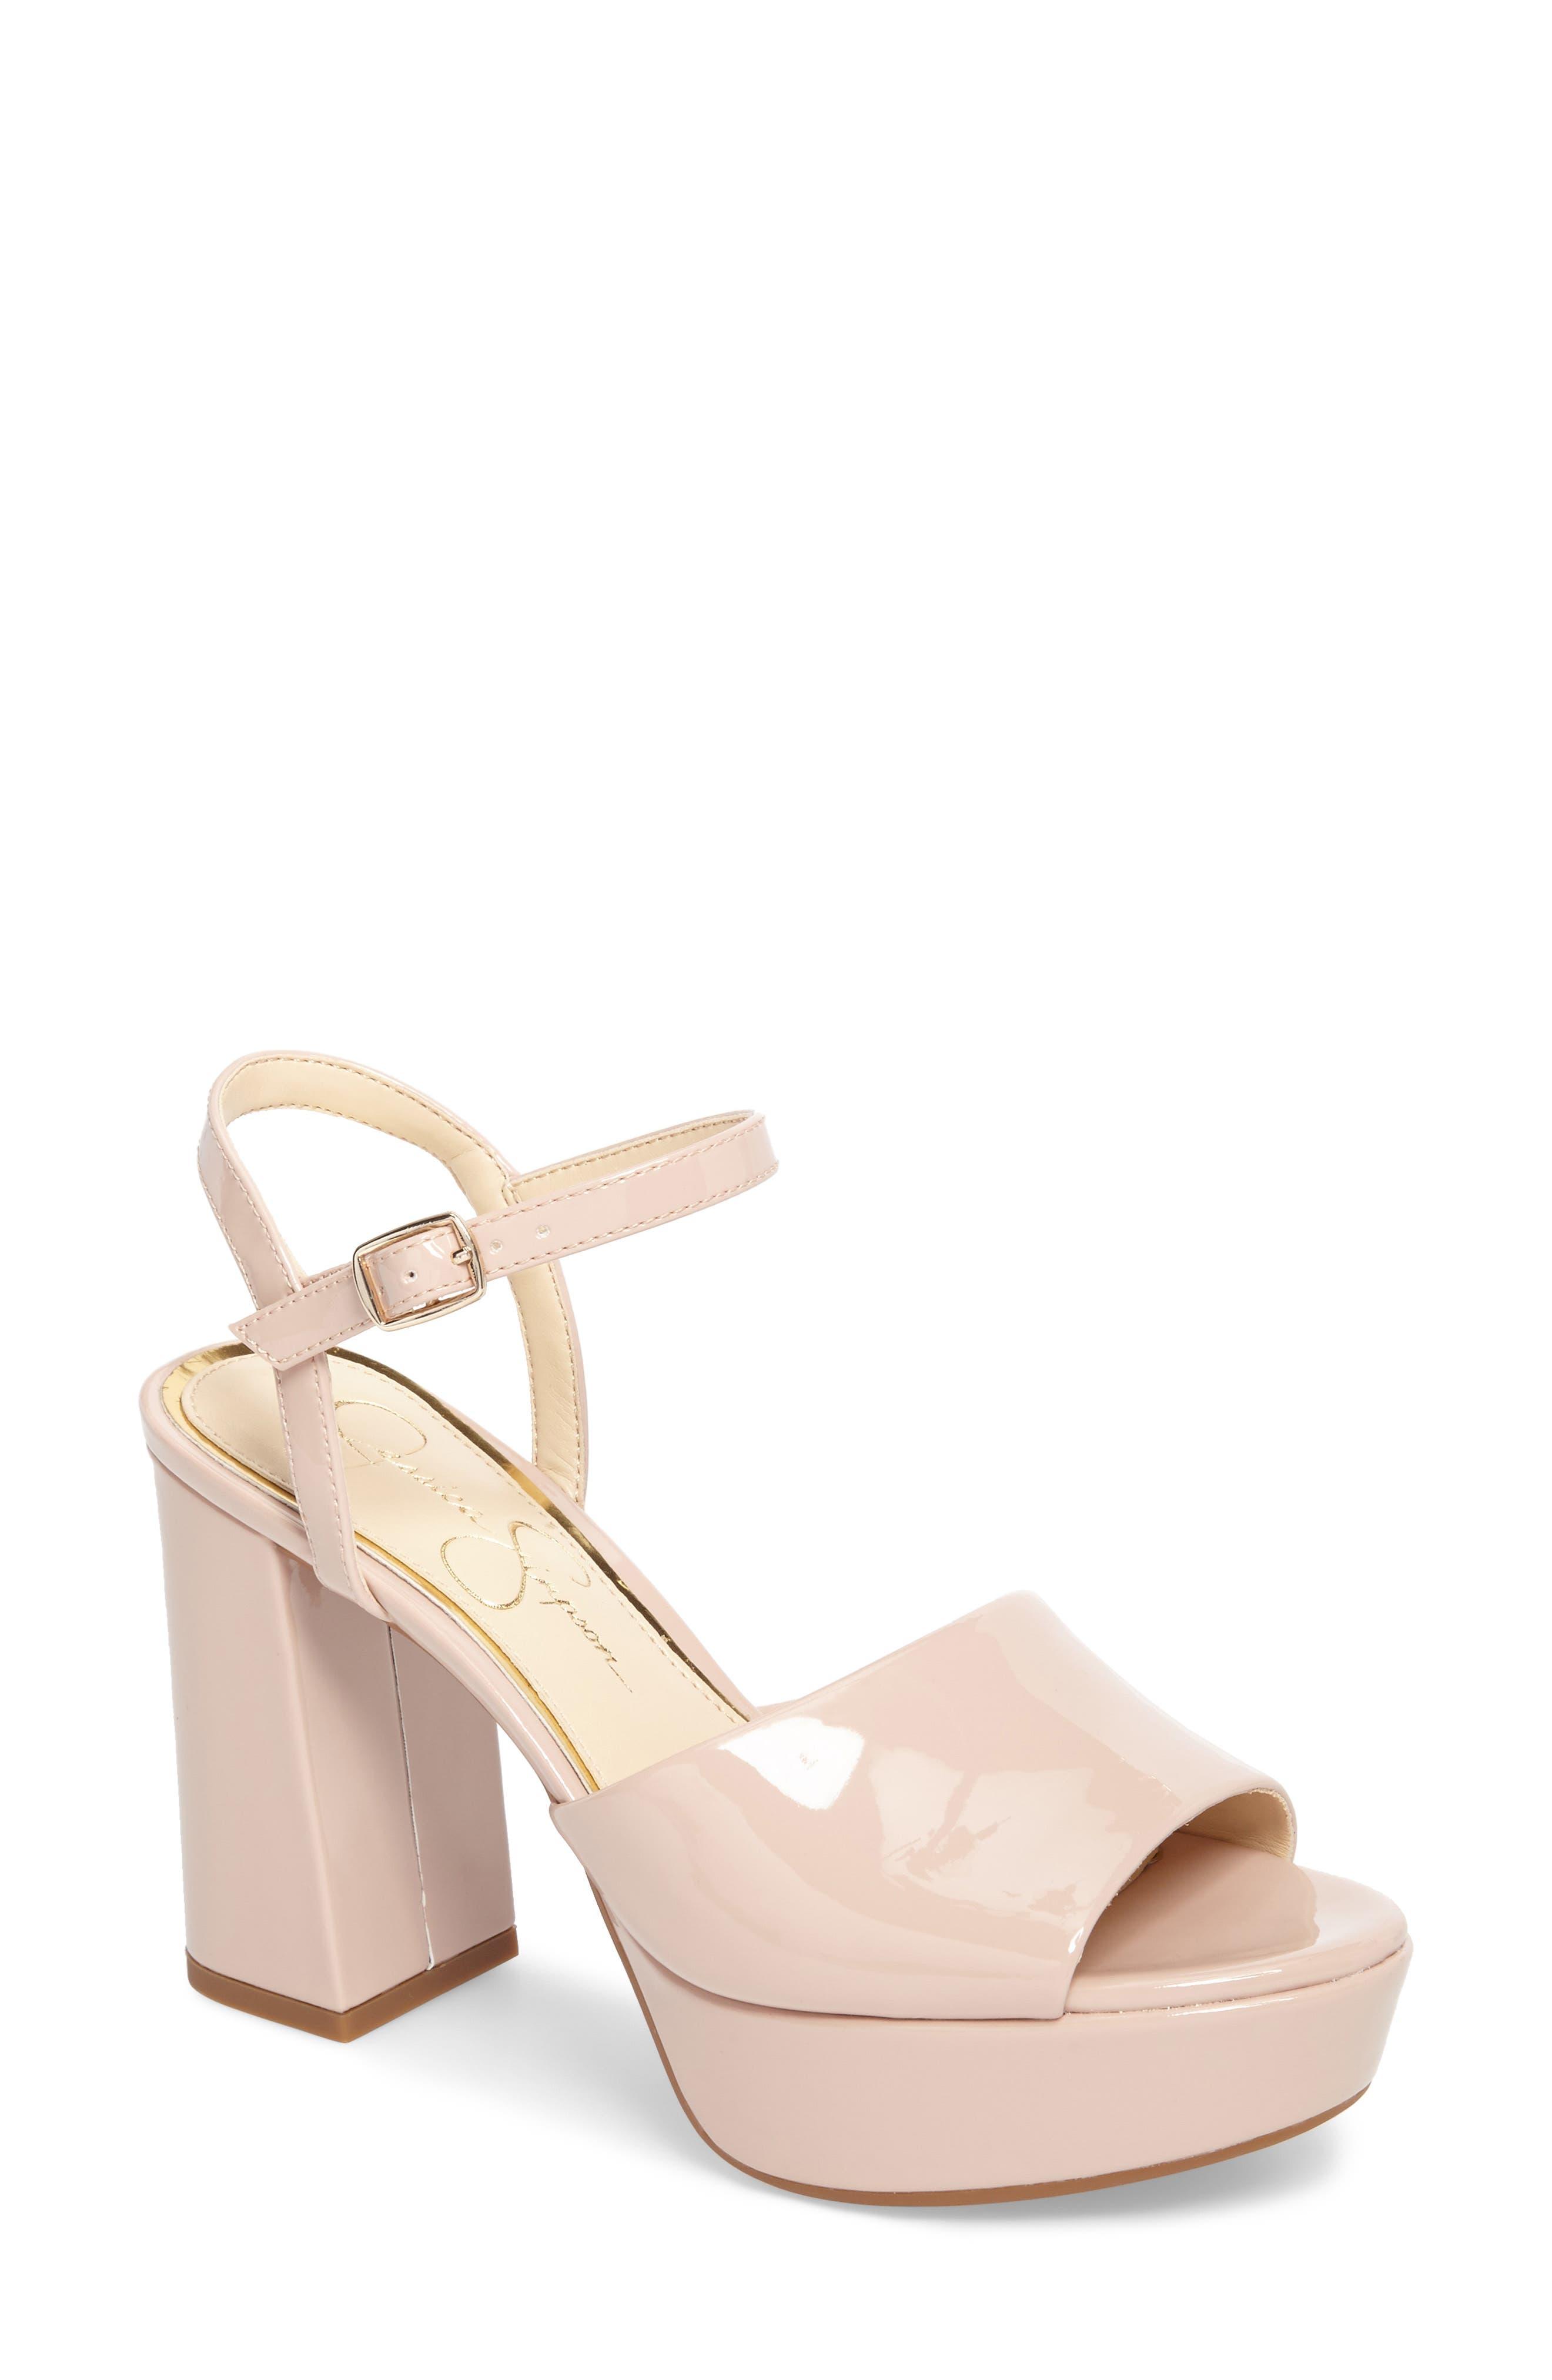 Alternate Image 1 Selected - Jessica Simpson Kerrick Platform Sandal (Women)